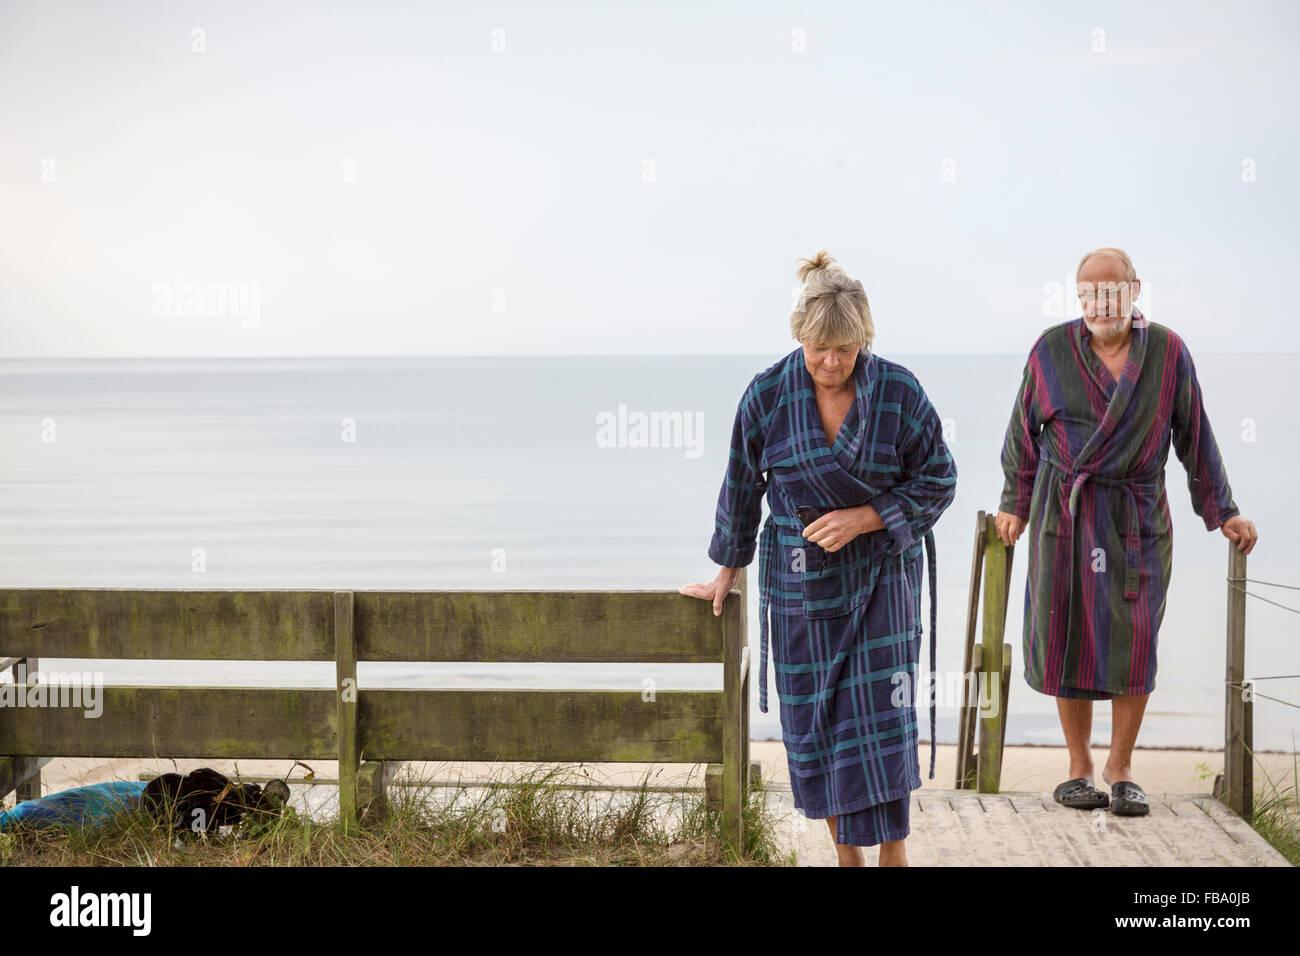 Sweden, Skane, Ahus, Senior couple coming back from beach in bathrobes - Stock Image